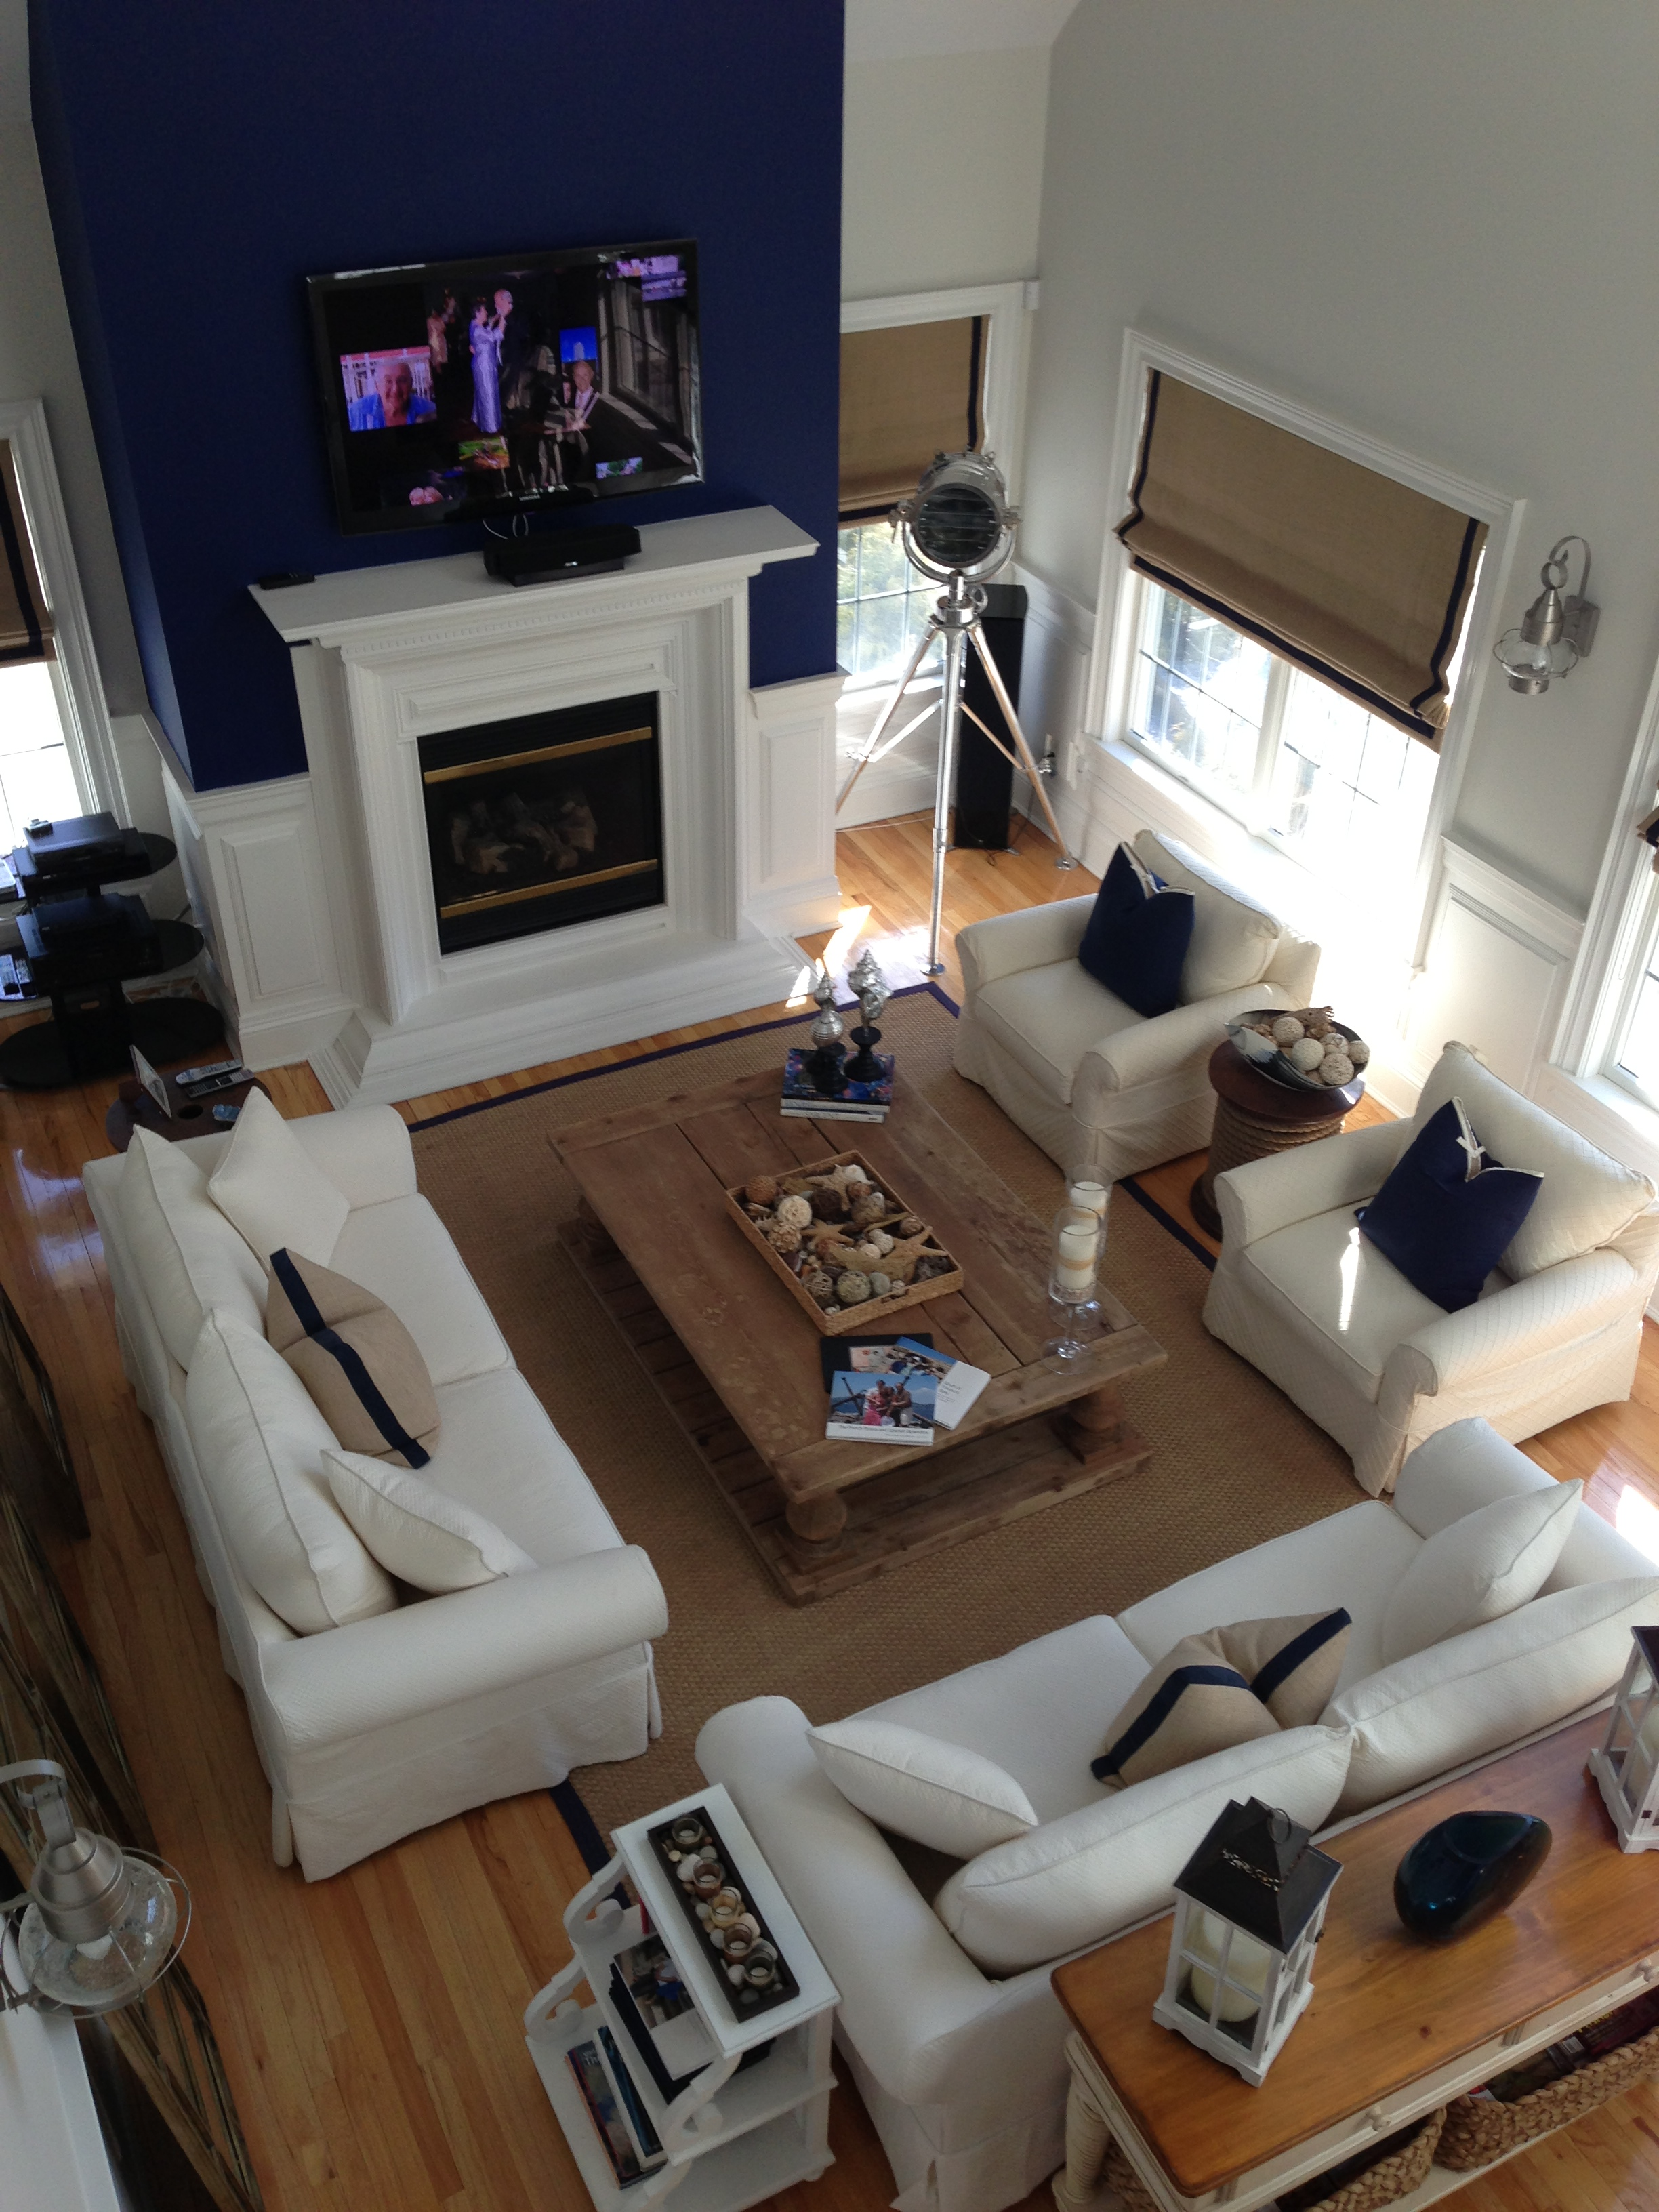 Modern design living room with set of white sofa